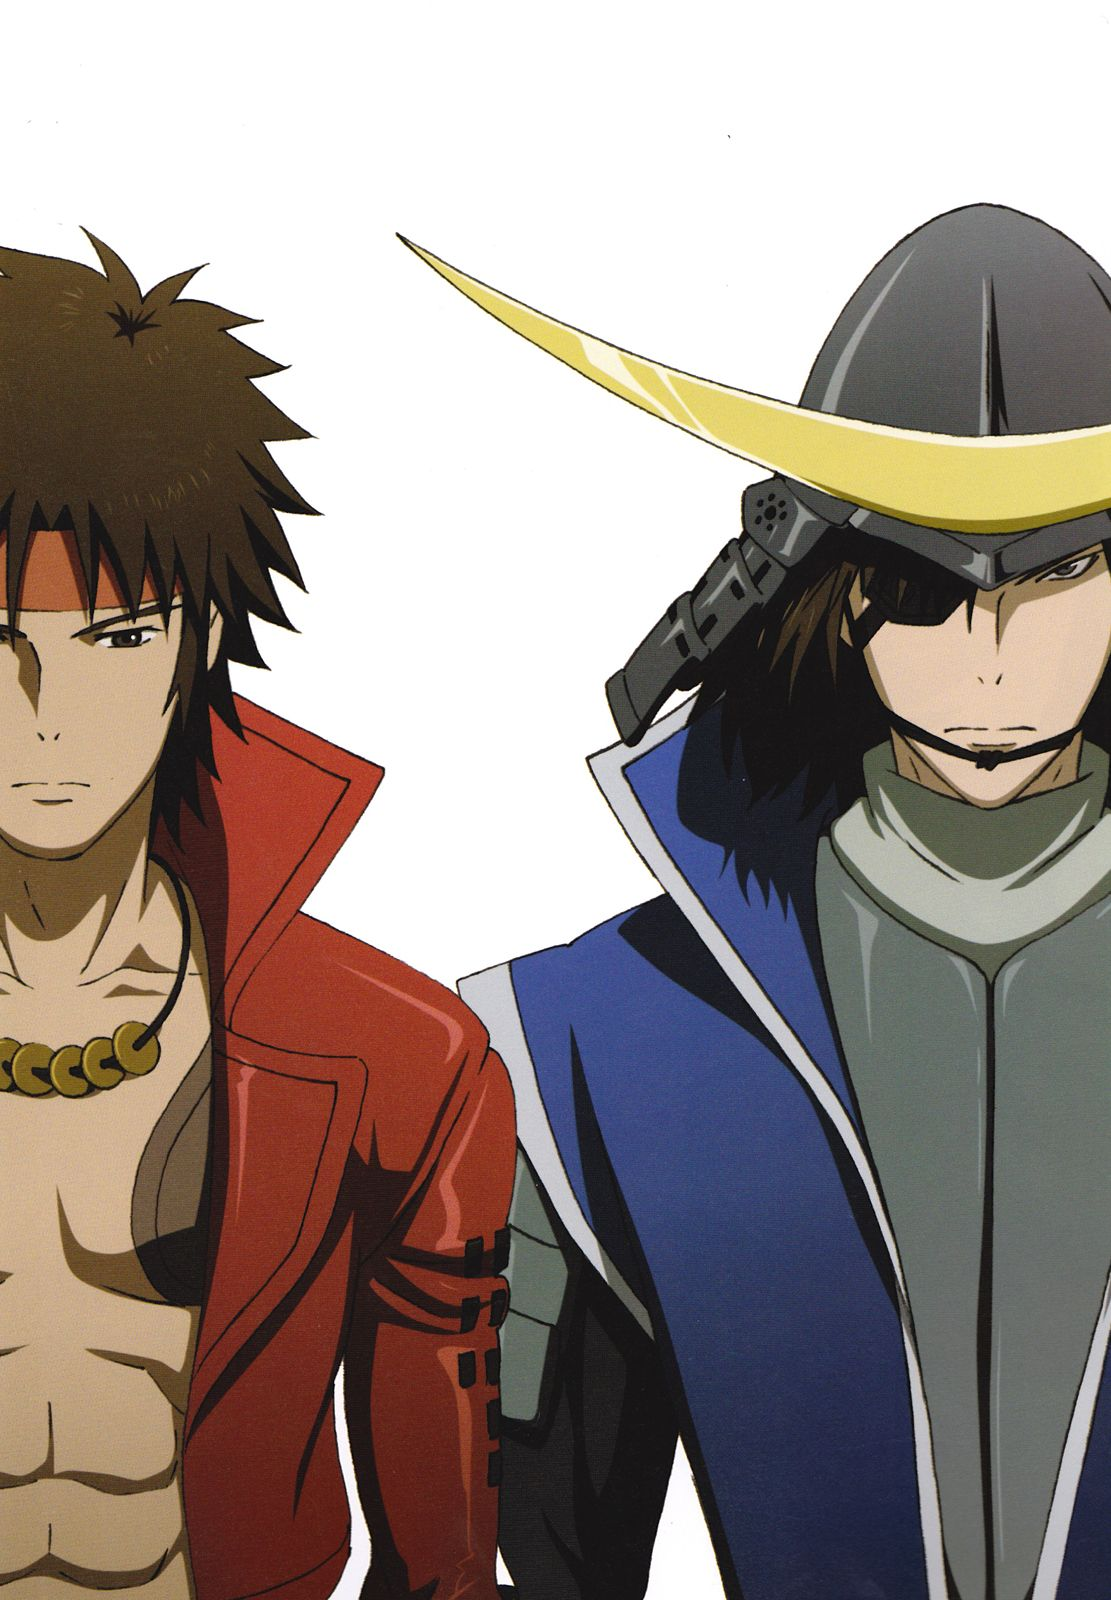 Date Masamune, Sanada Yukimura, Sengoku Basara Basara